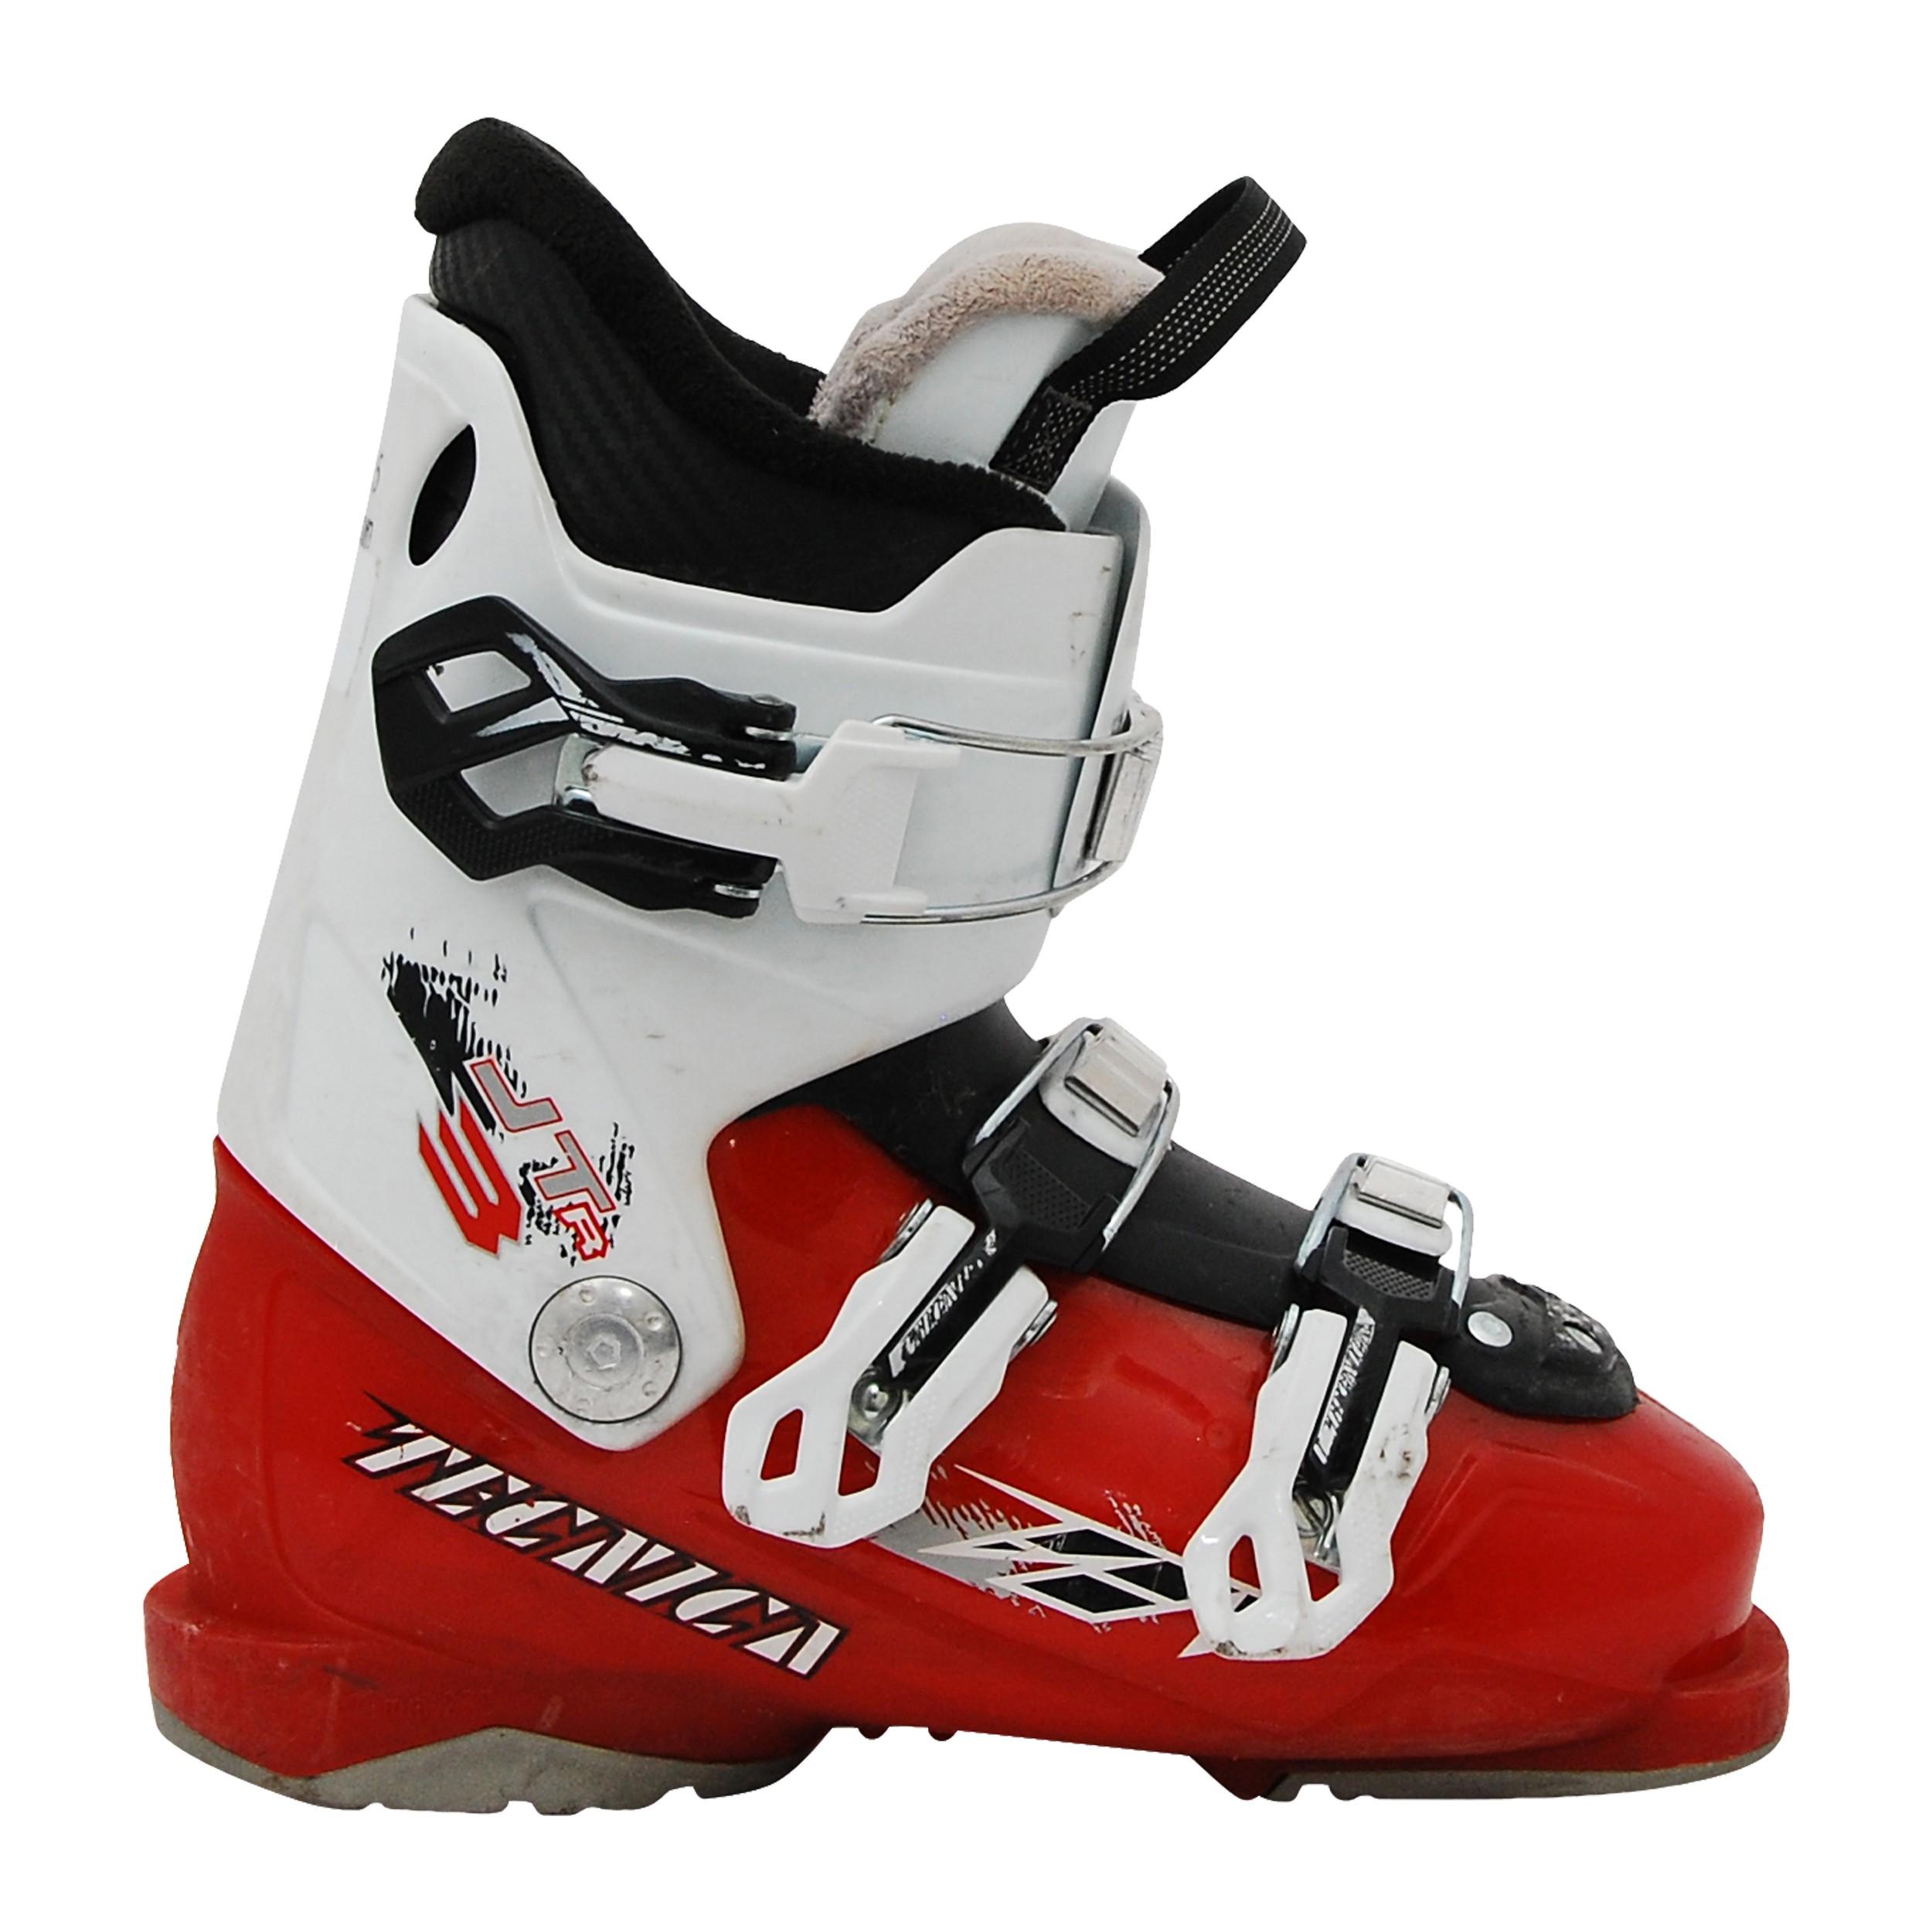 Chaussure de ski Junior Occasion Tecnica JT 23 orangenoir